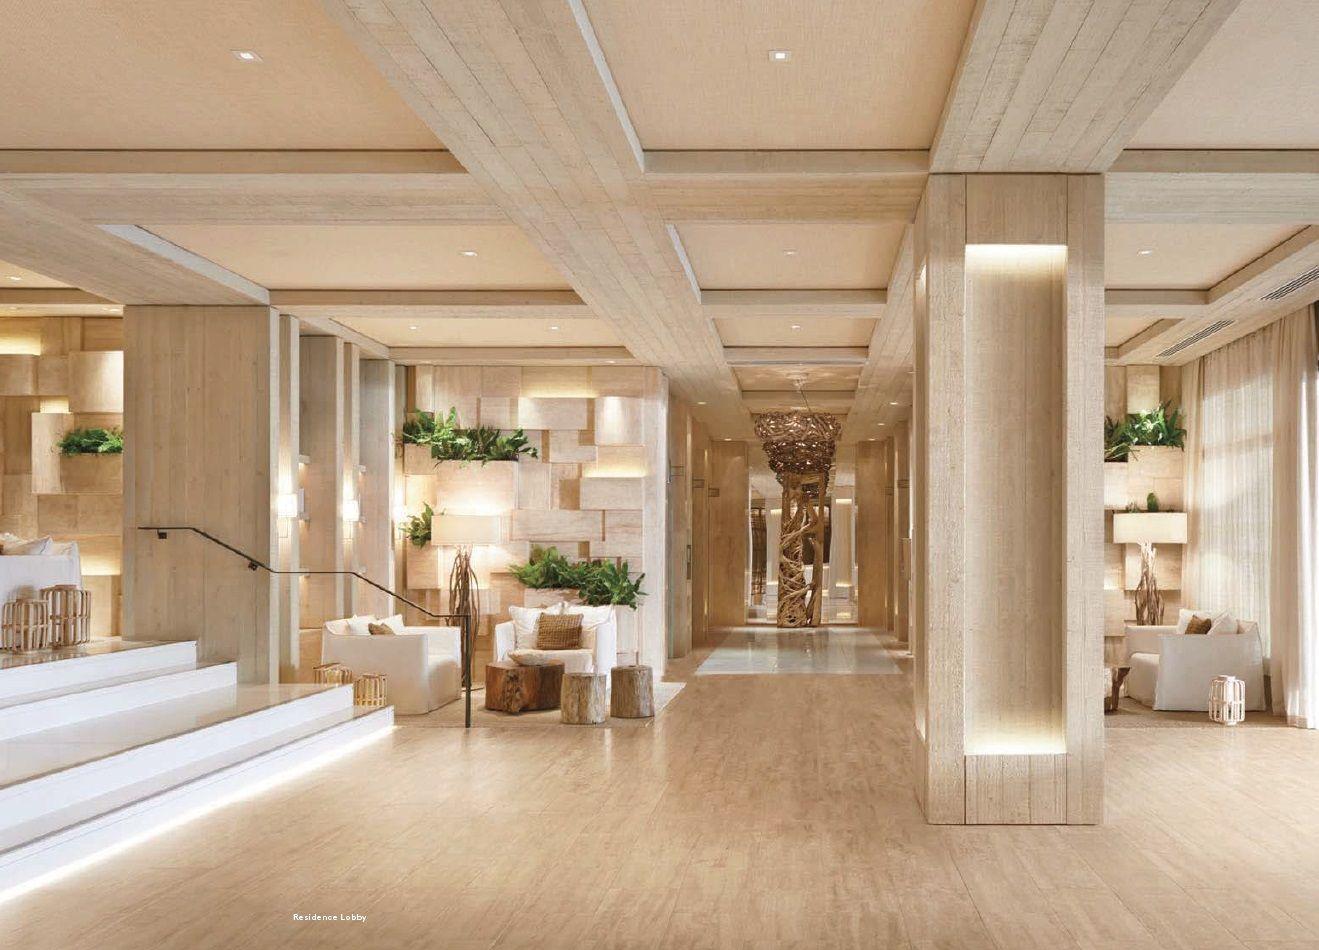 1 Hotel South Beach Lobby Google Search Hotel Style South Beach Hotels